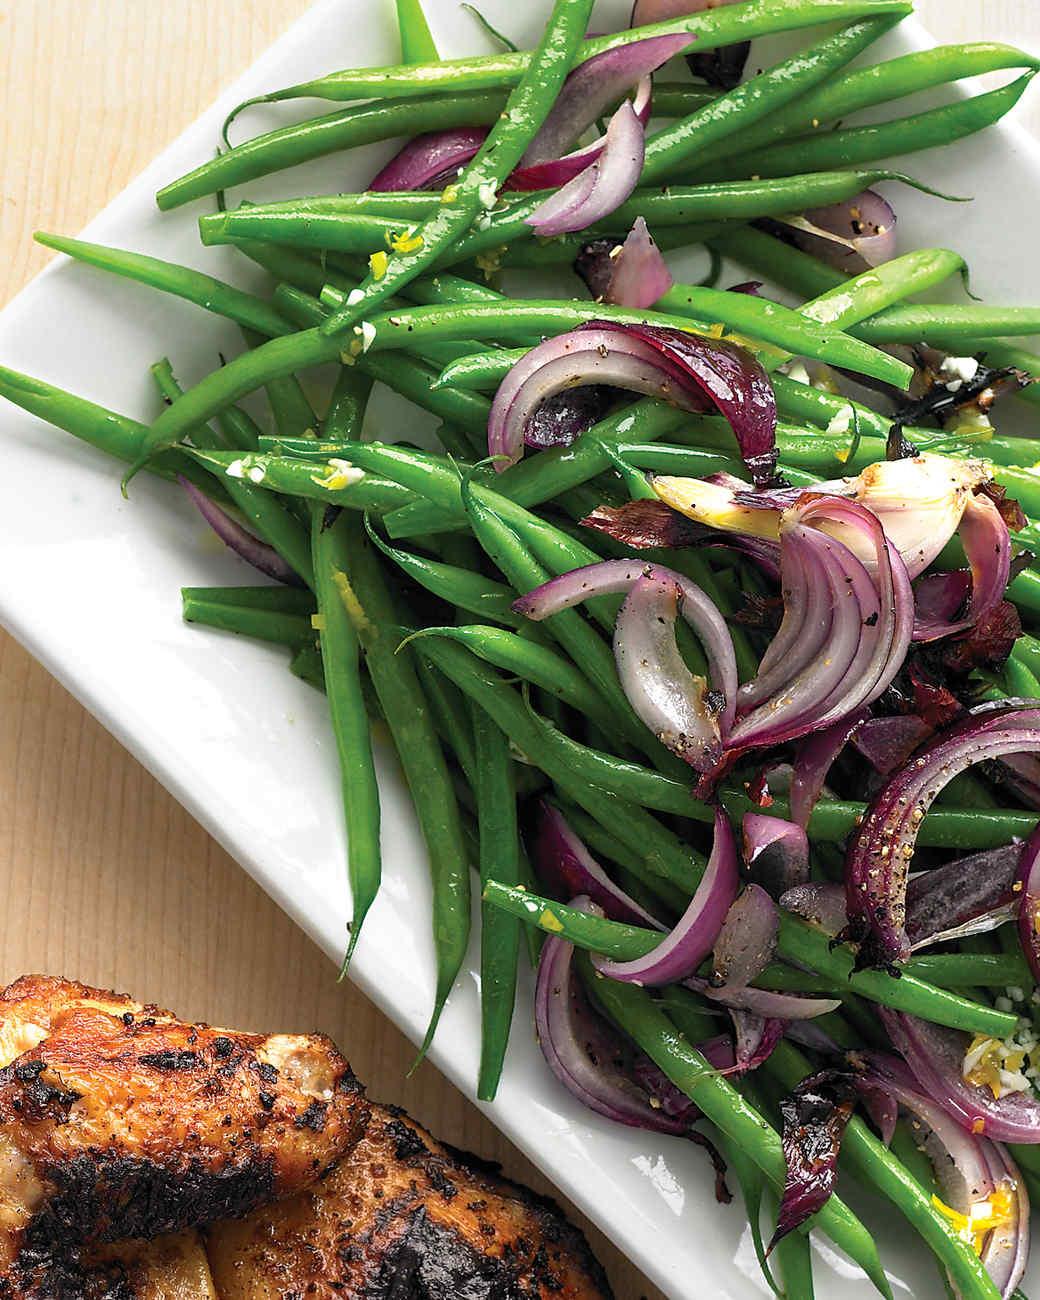 Emeril's Green Bean Salad